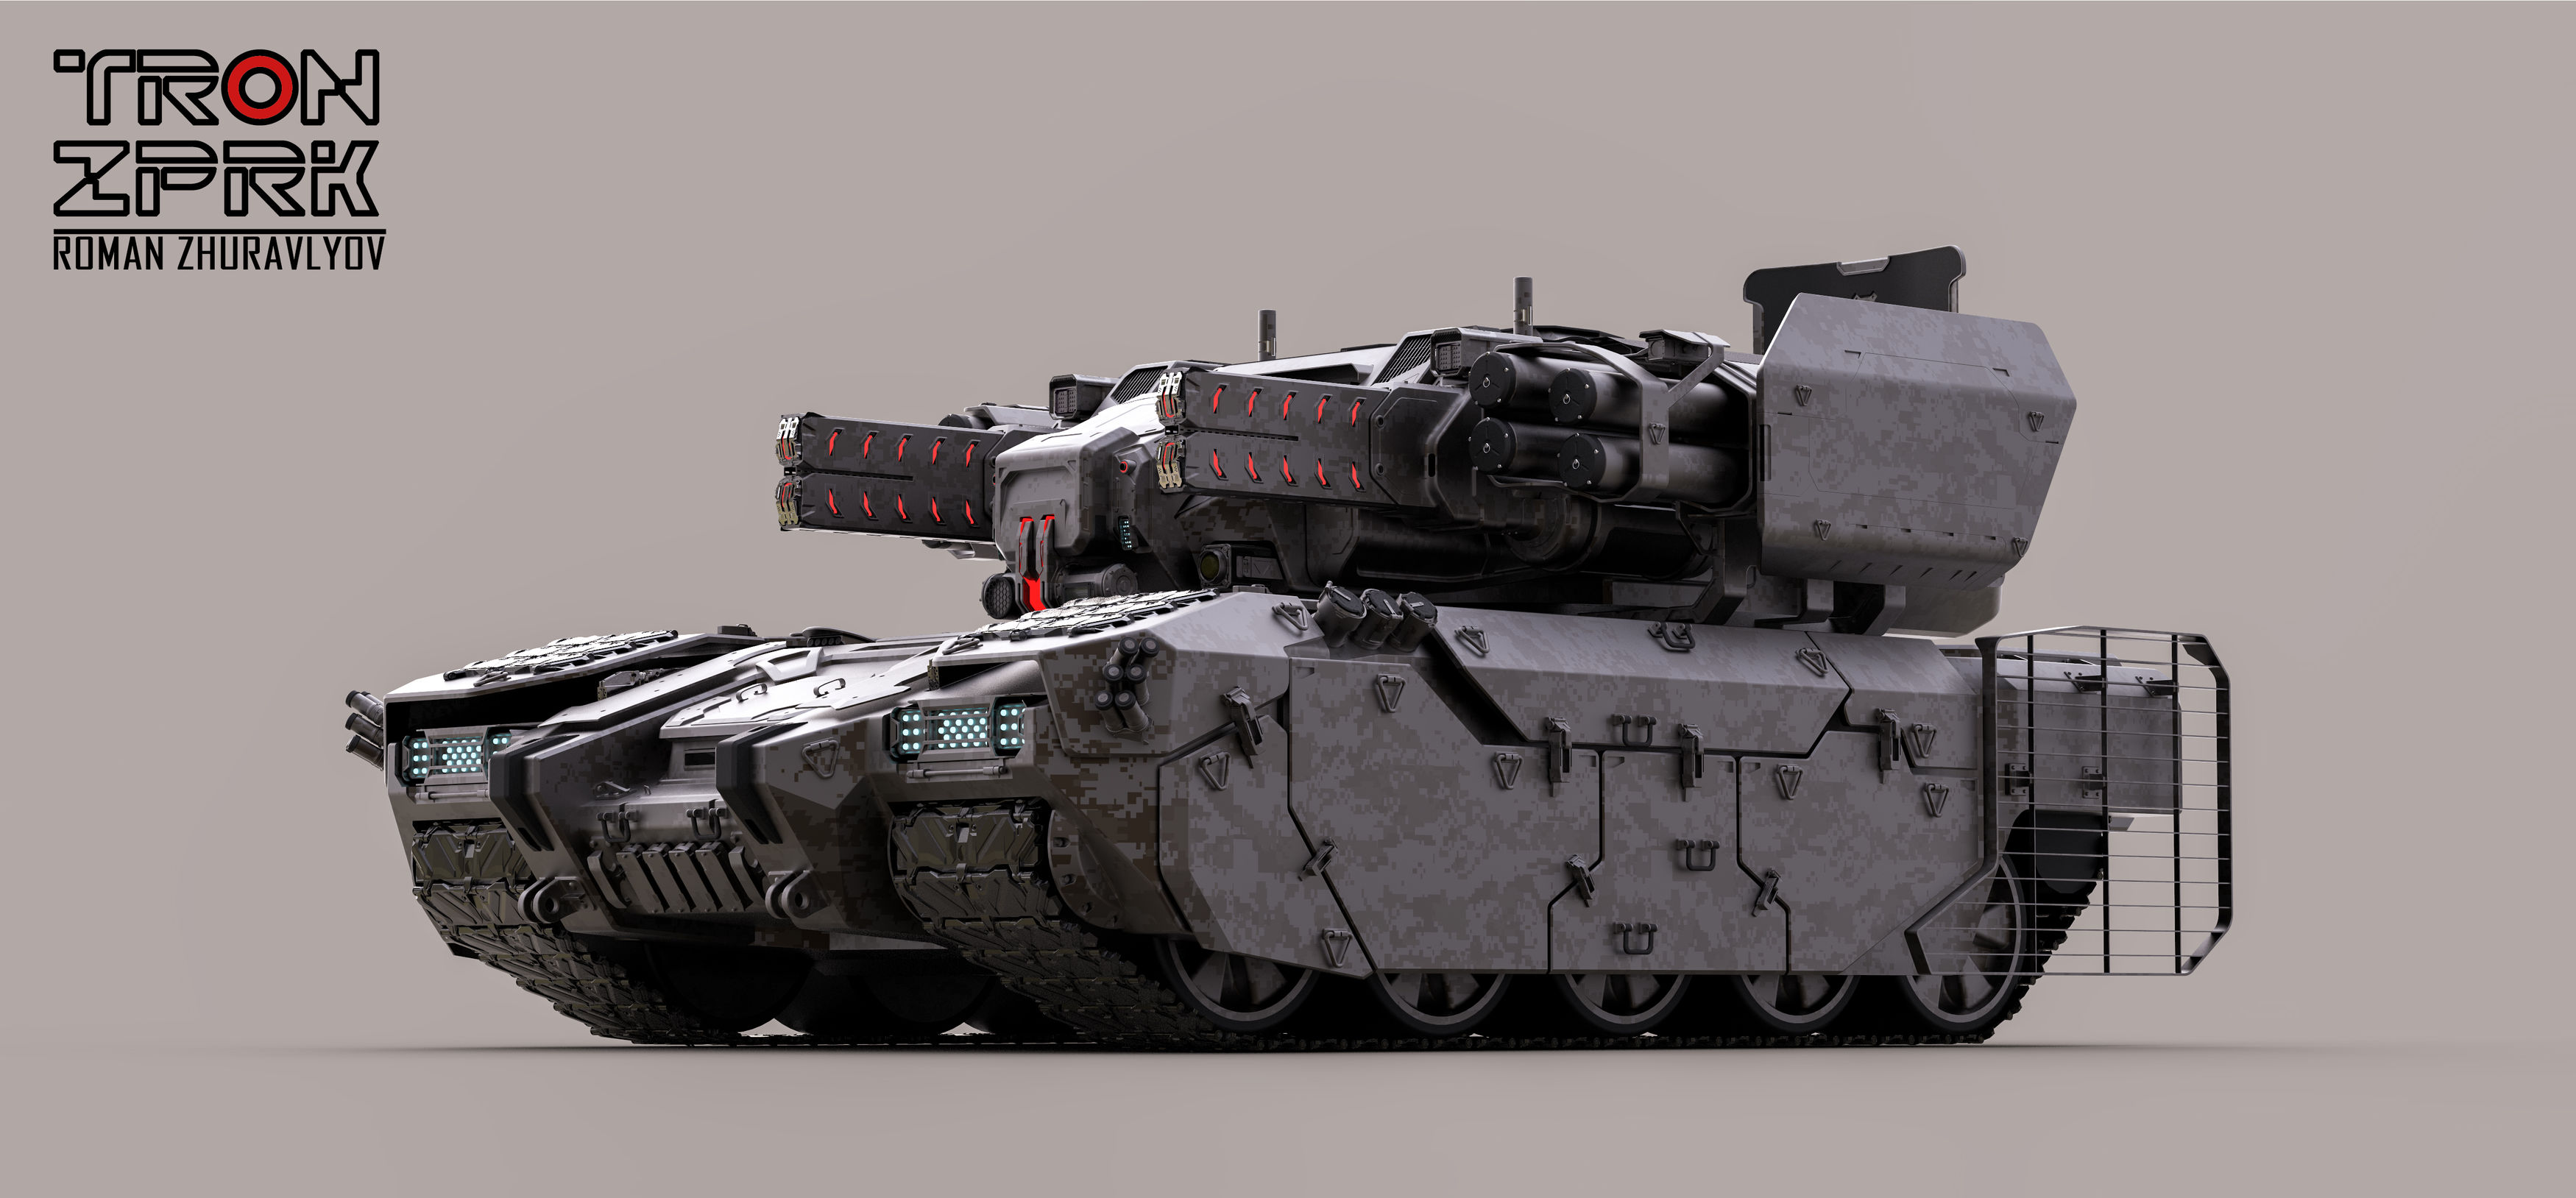 Zprk-tron-3-3500-3500